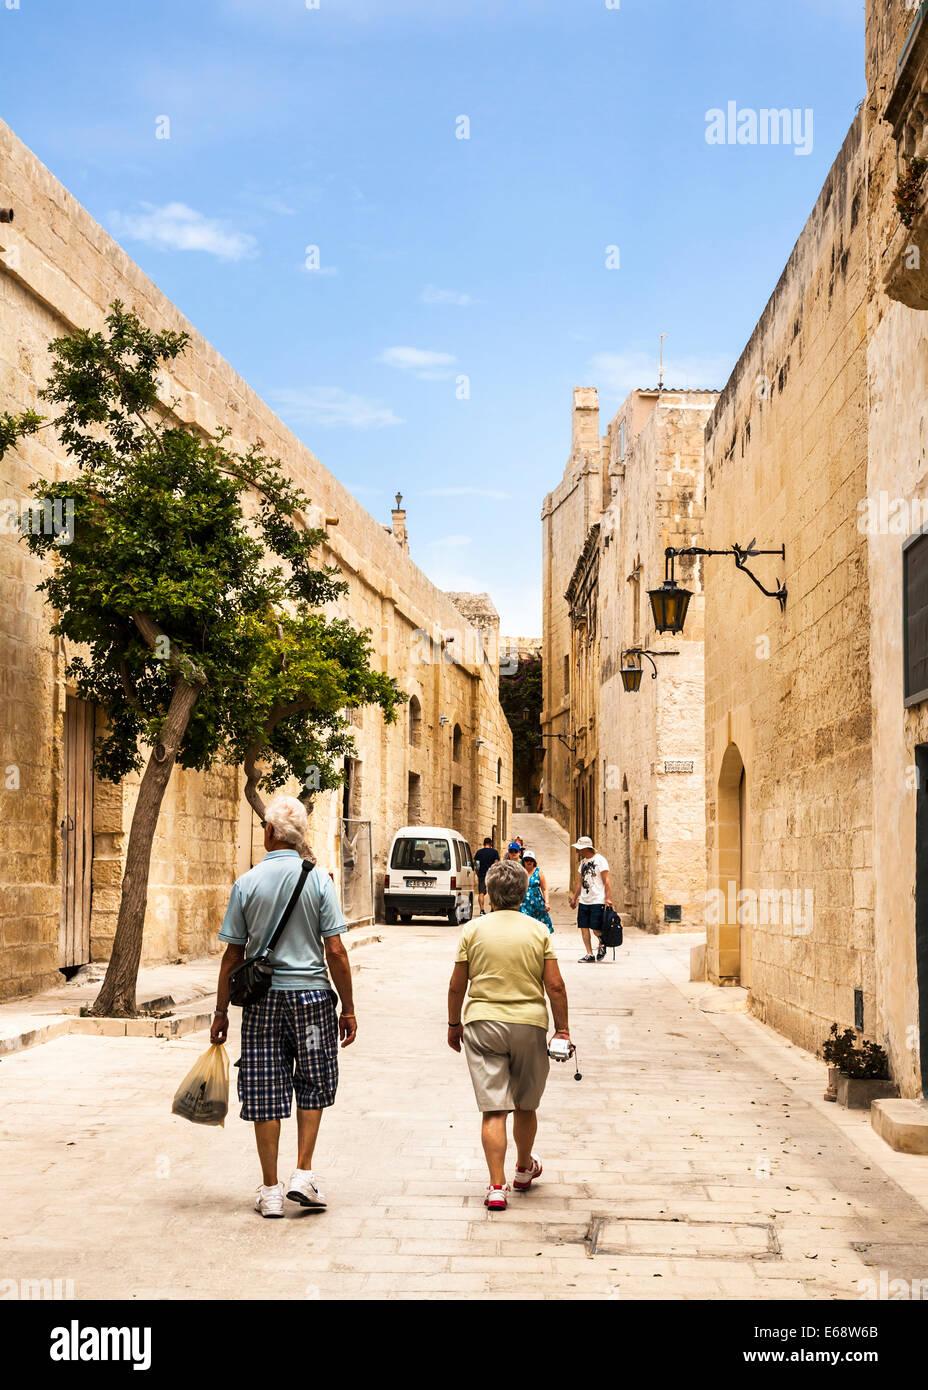 Tourists walking along Mdina's narrow medieval streets, Mdina, Malta. - Stock Image